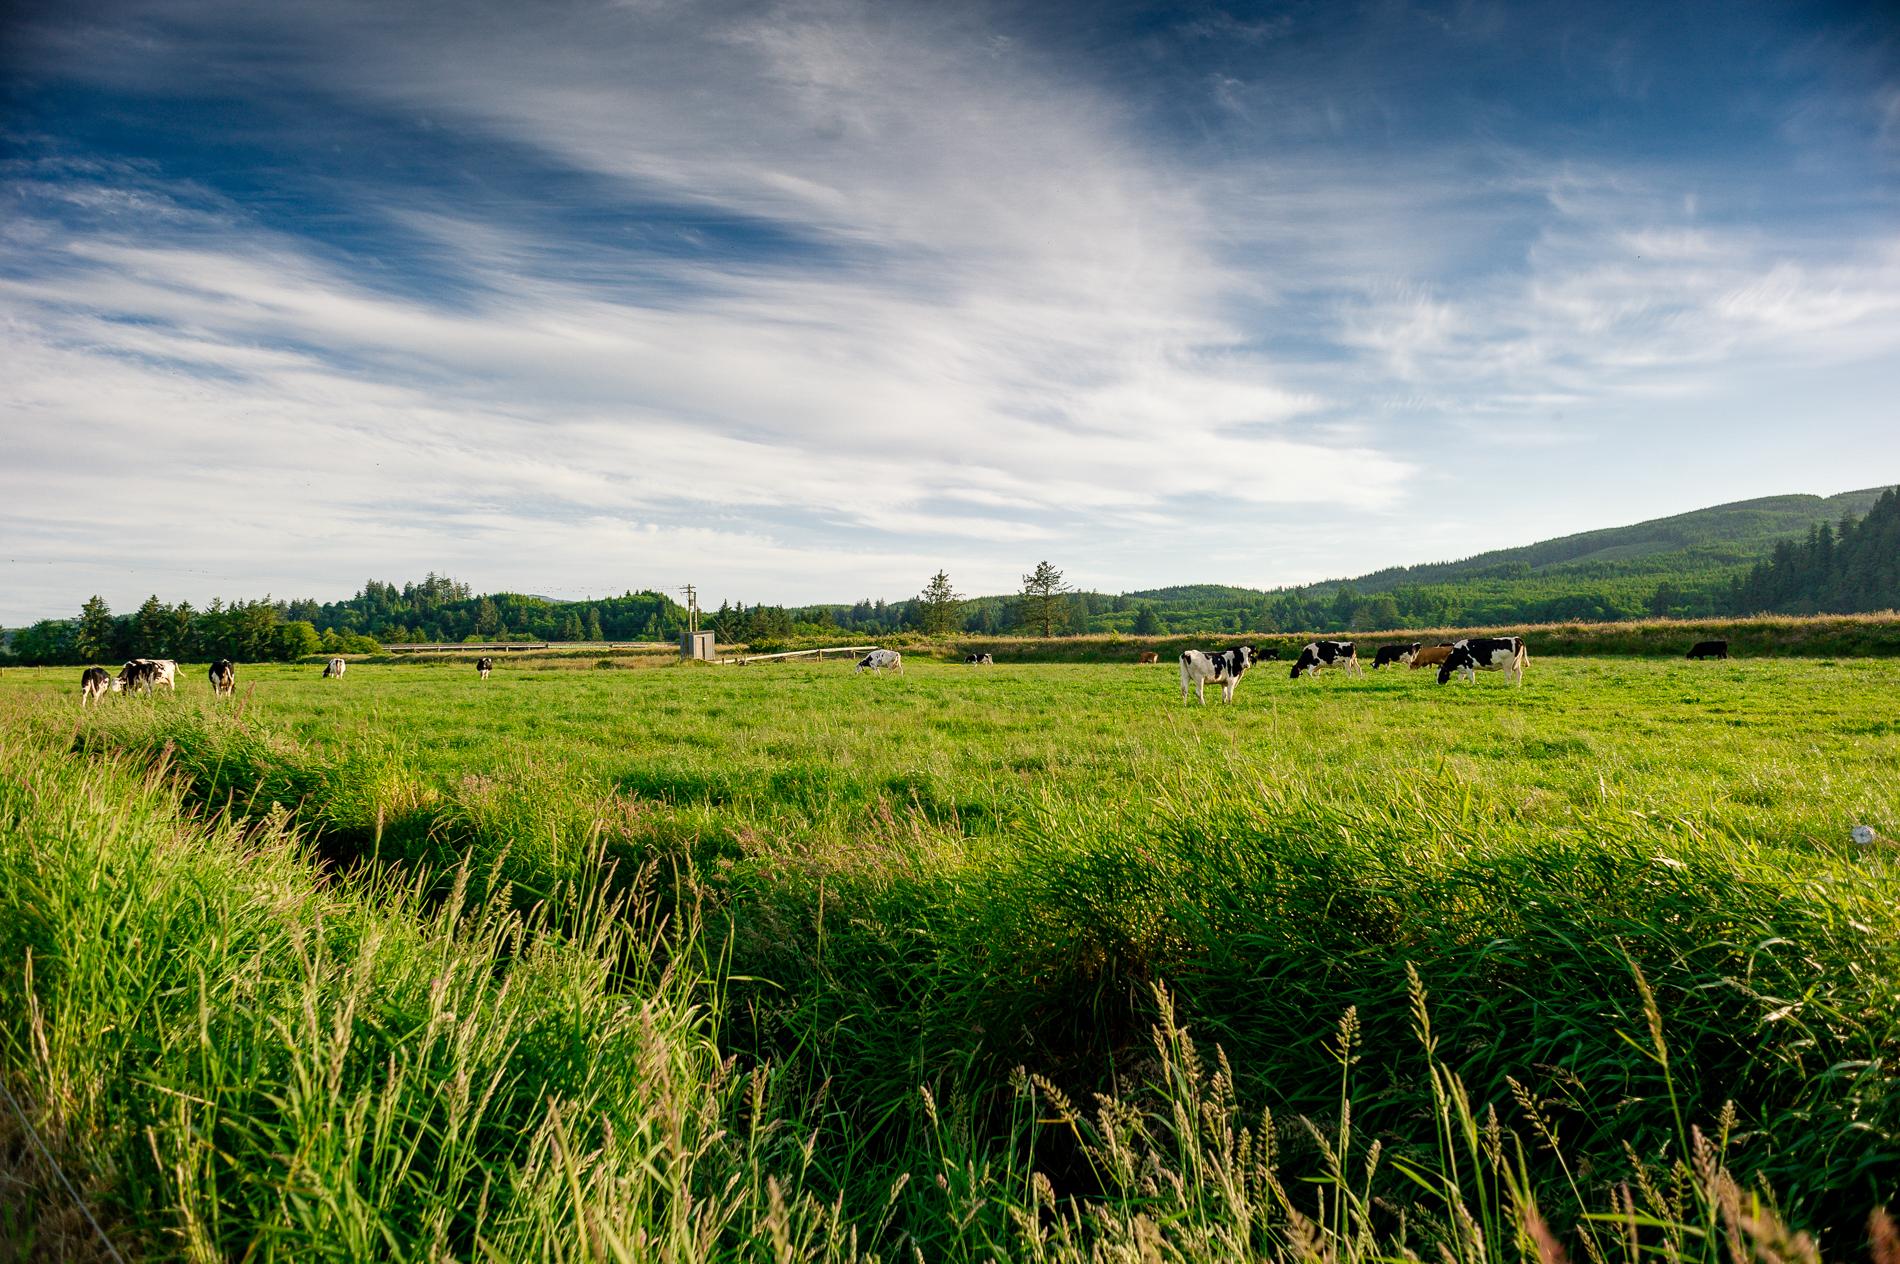 Free Range Dairy Cows